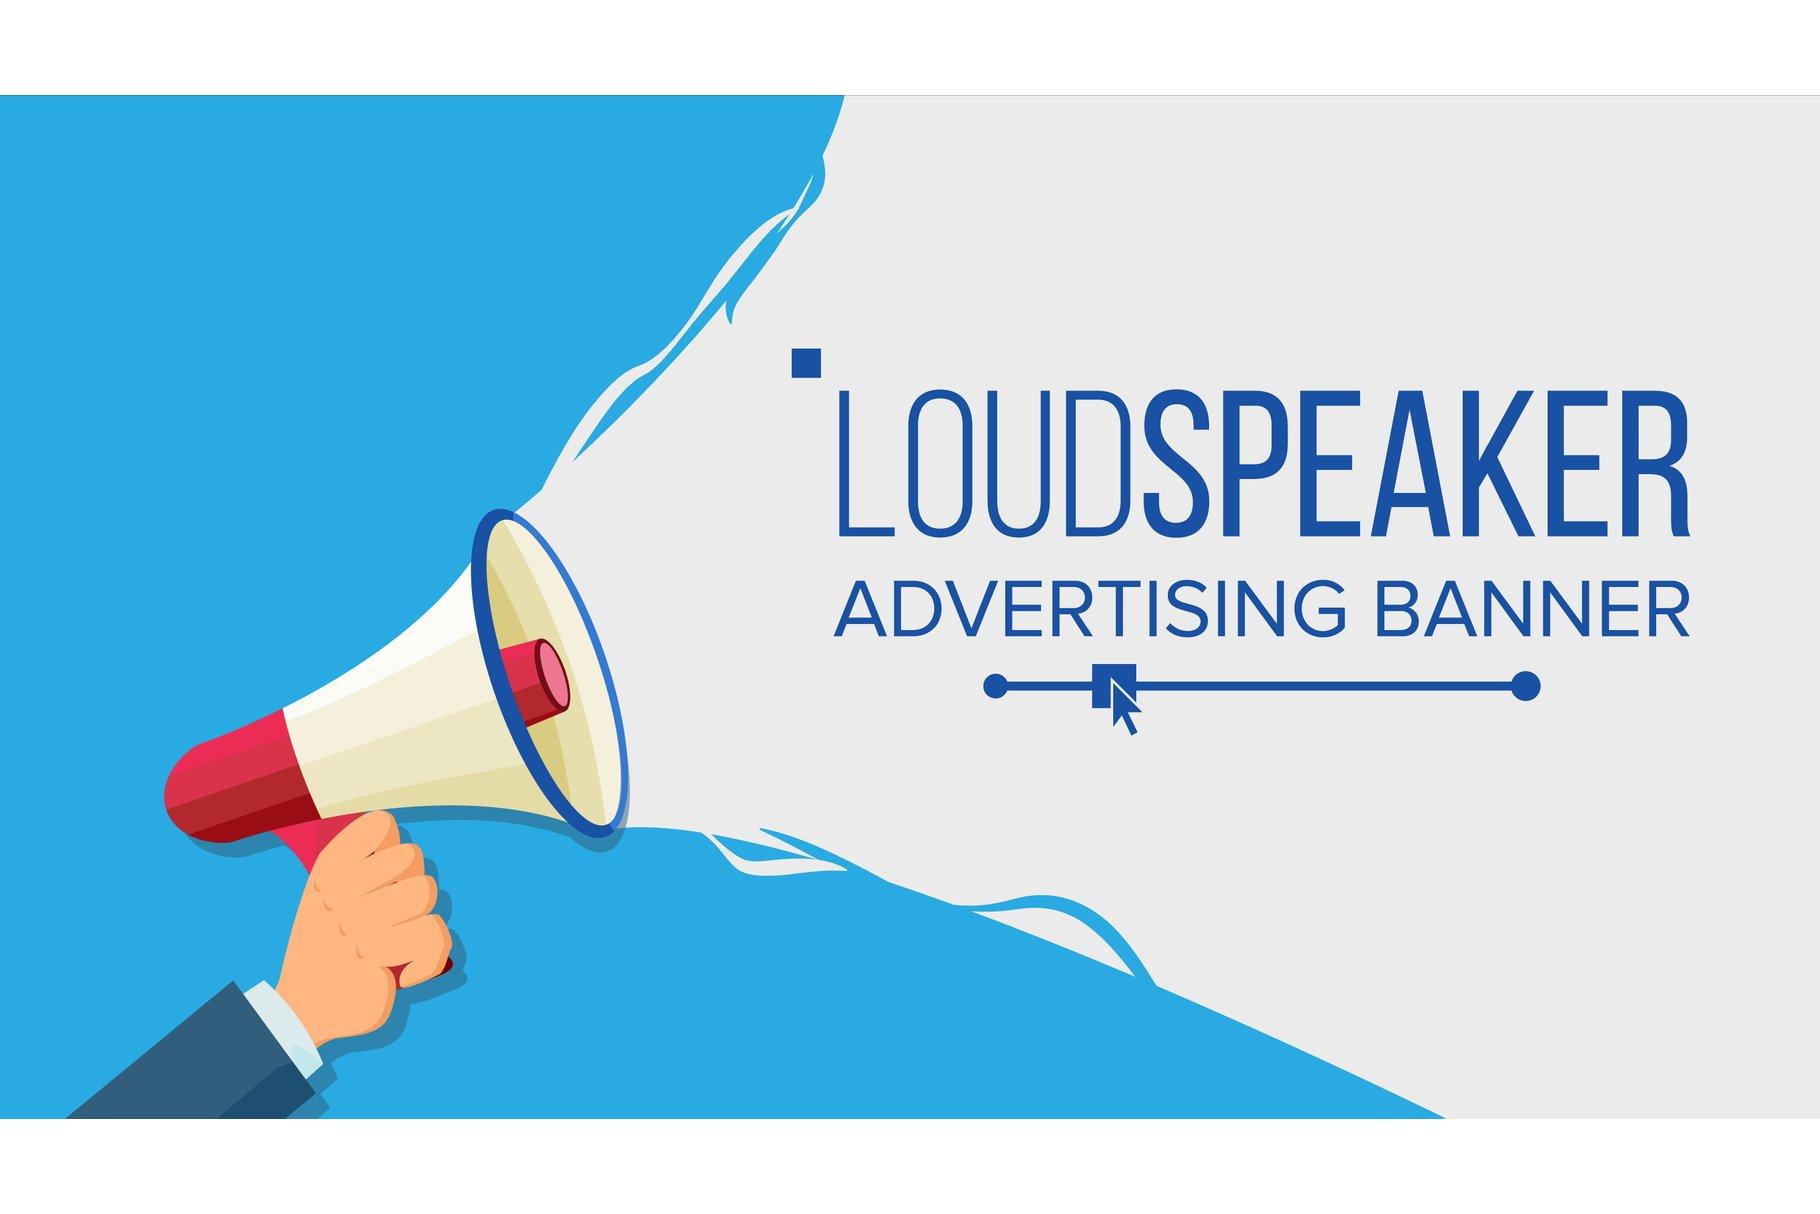 Loudspeaker In Hand Vector. Marketing Sign example image 1